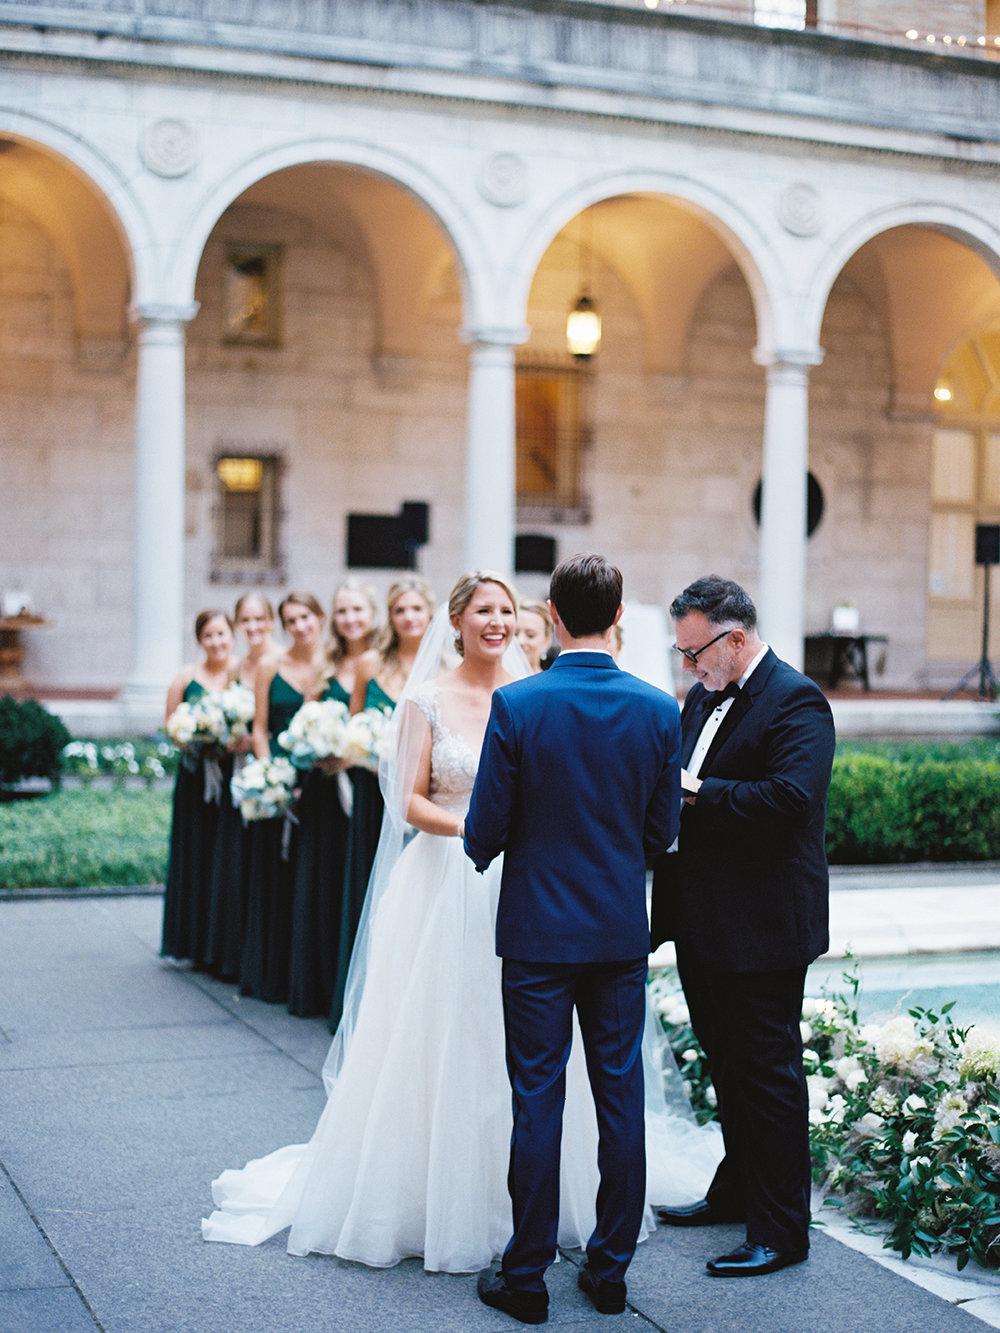 510-andrew-megan-boston-public-library-wedding-film-photographer.jpg